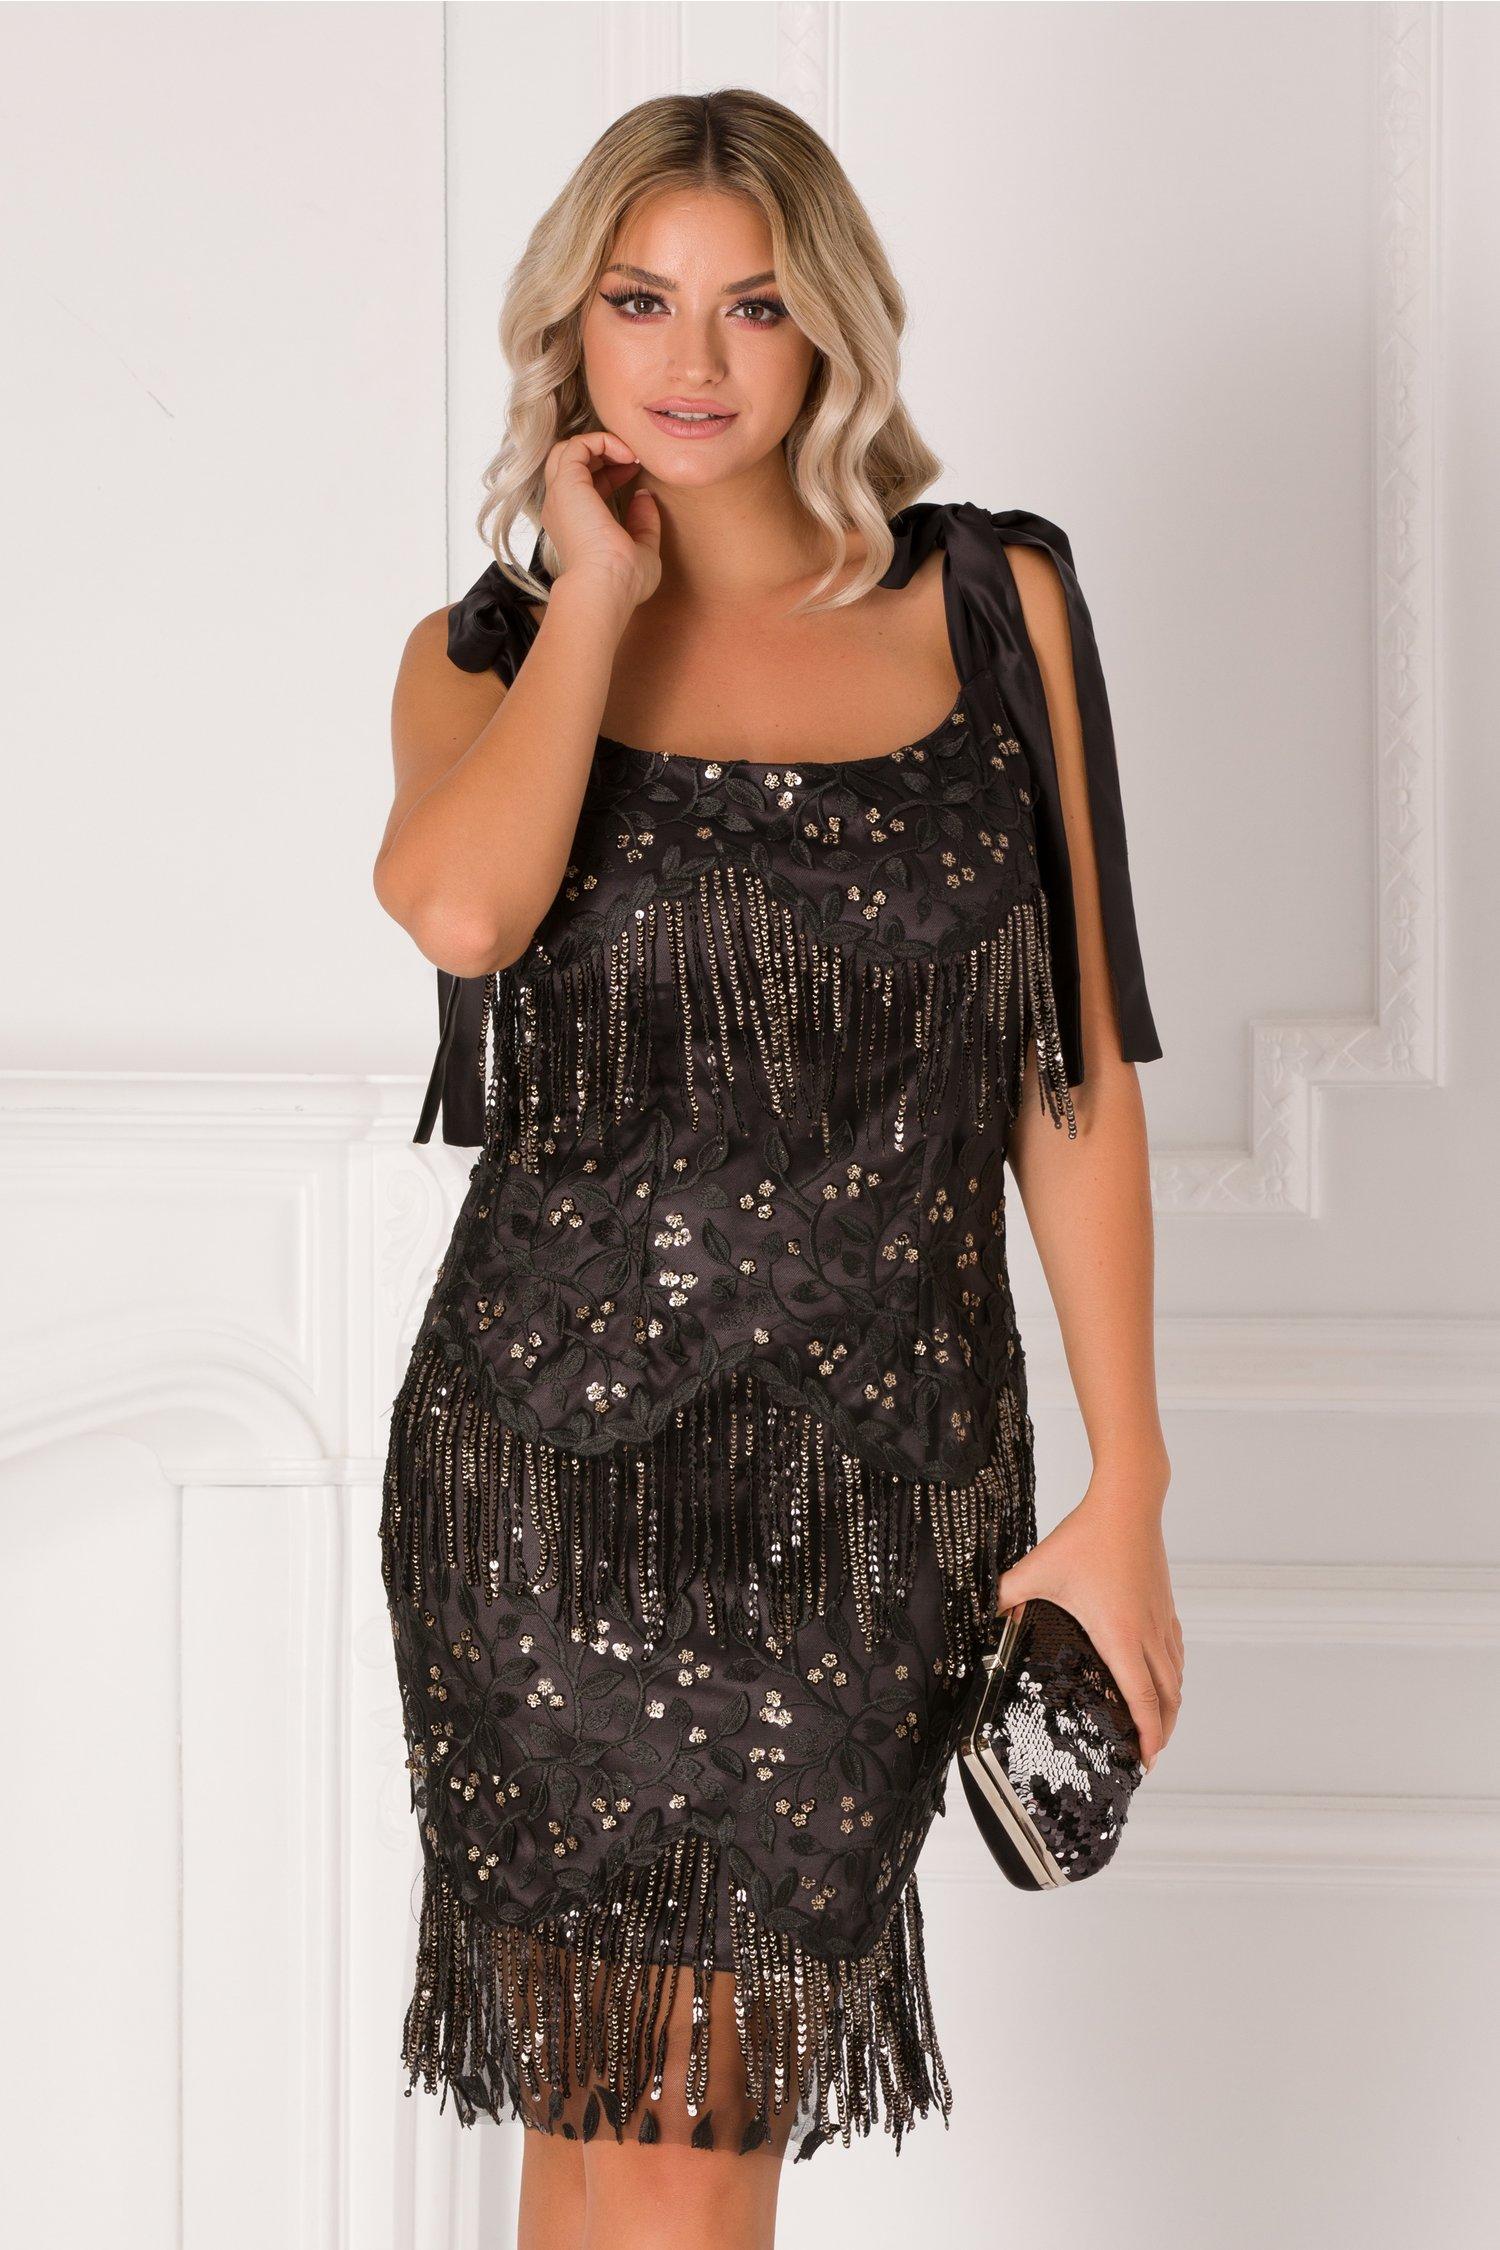 rochie mbg neagra cu dantela si paiete aurii 364579 4